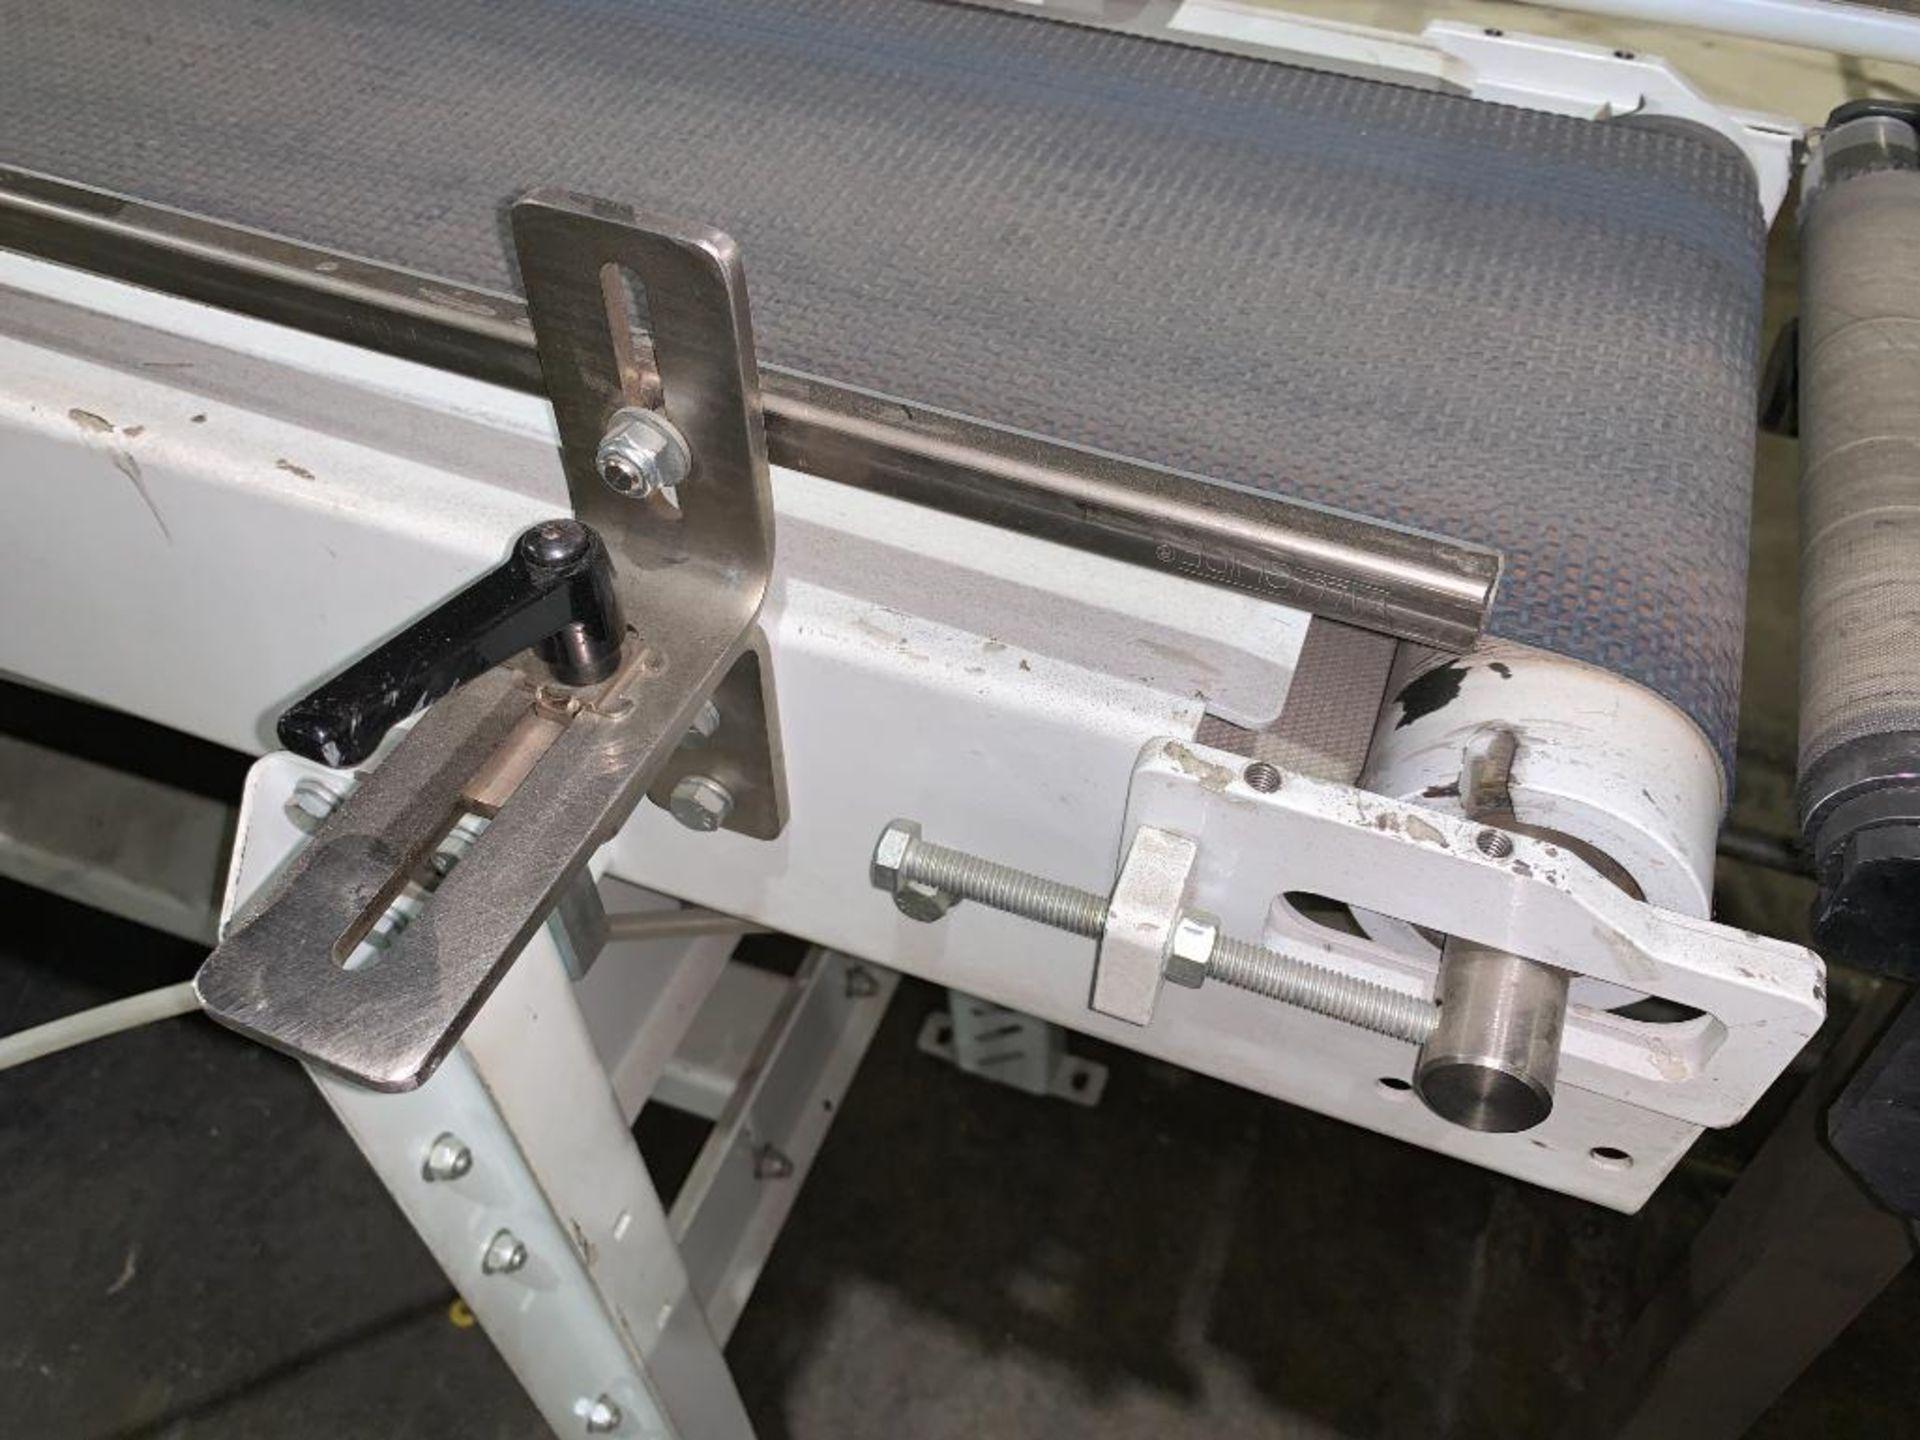 mild steel belt conveyor, 68 in. x 10 in., with box conditioner - Image 4 of 13